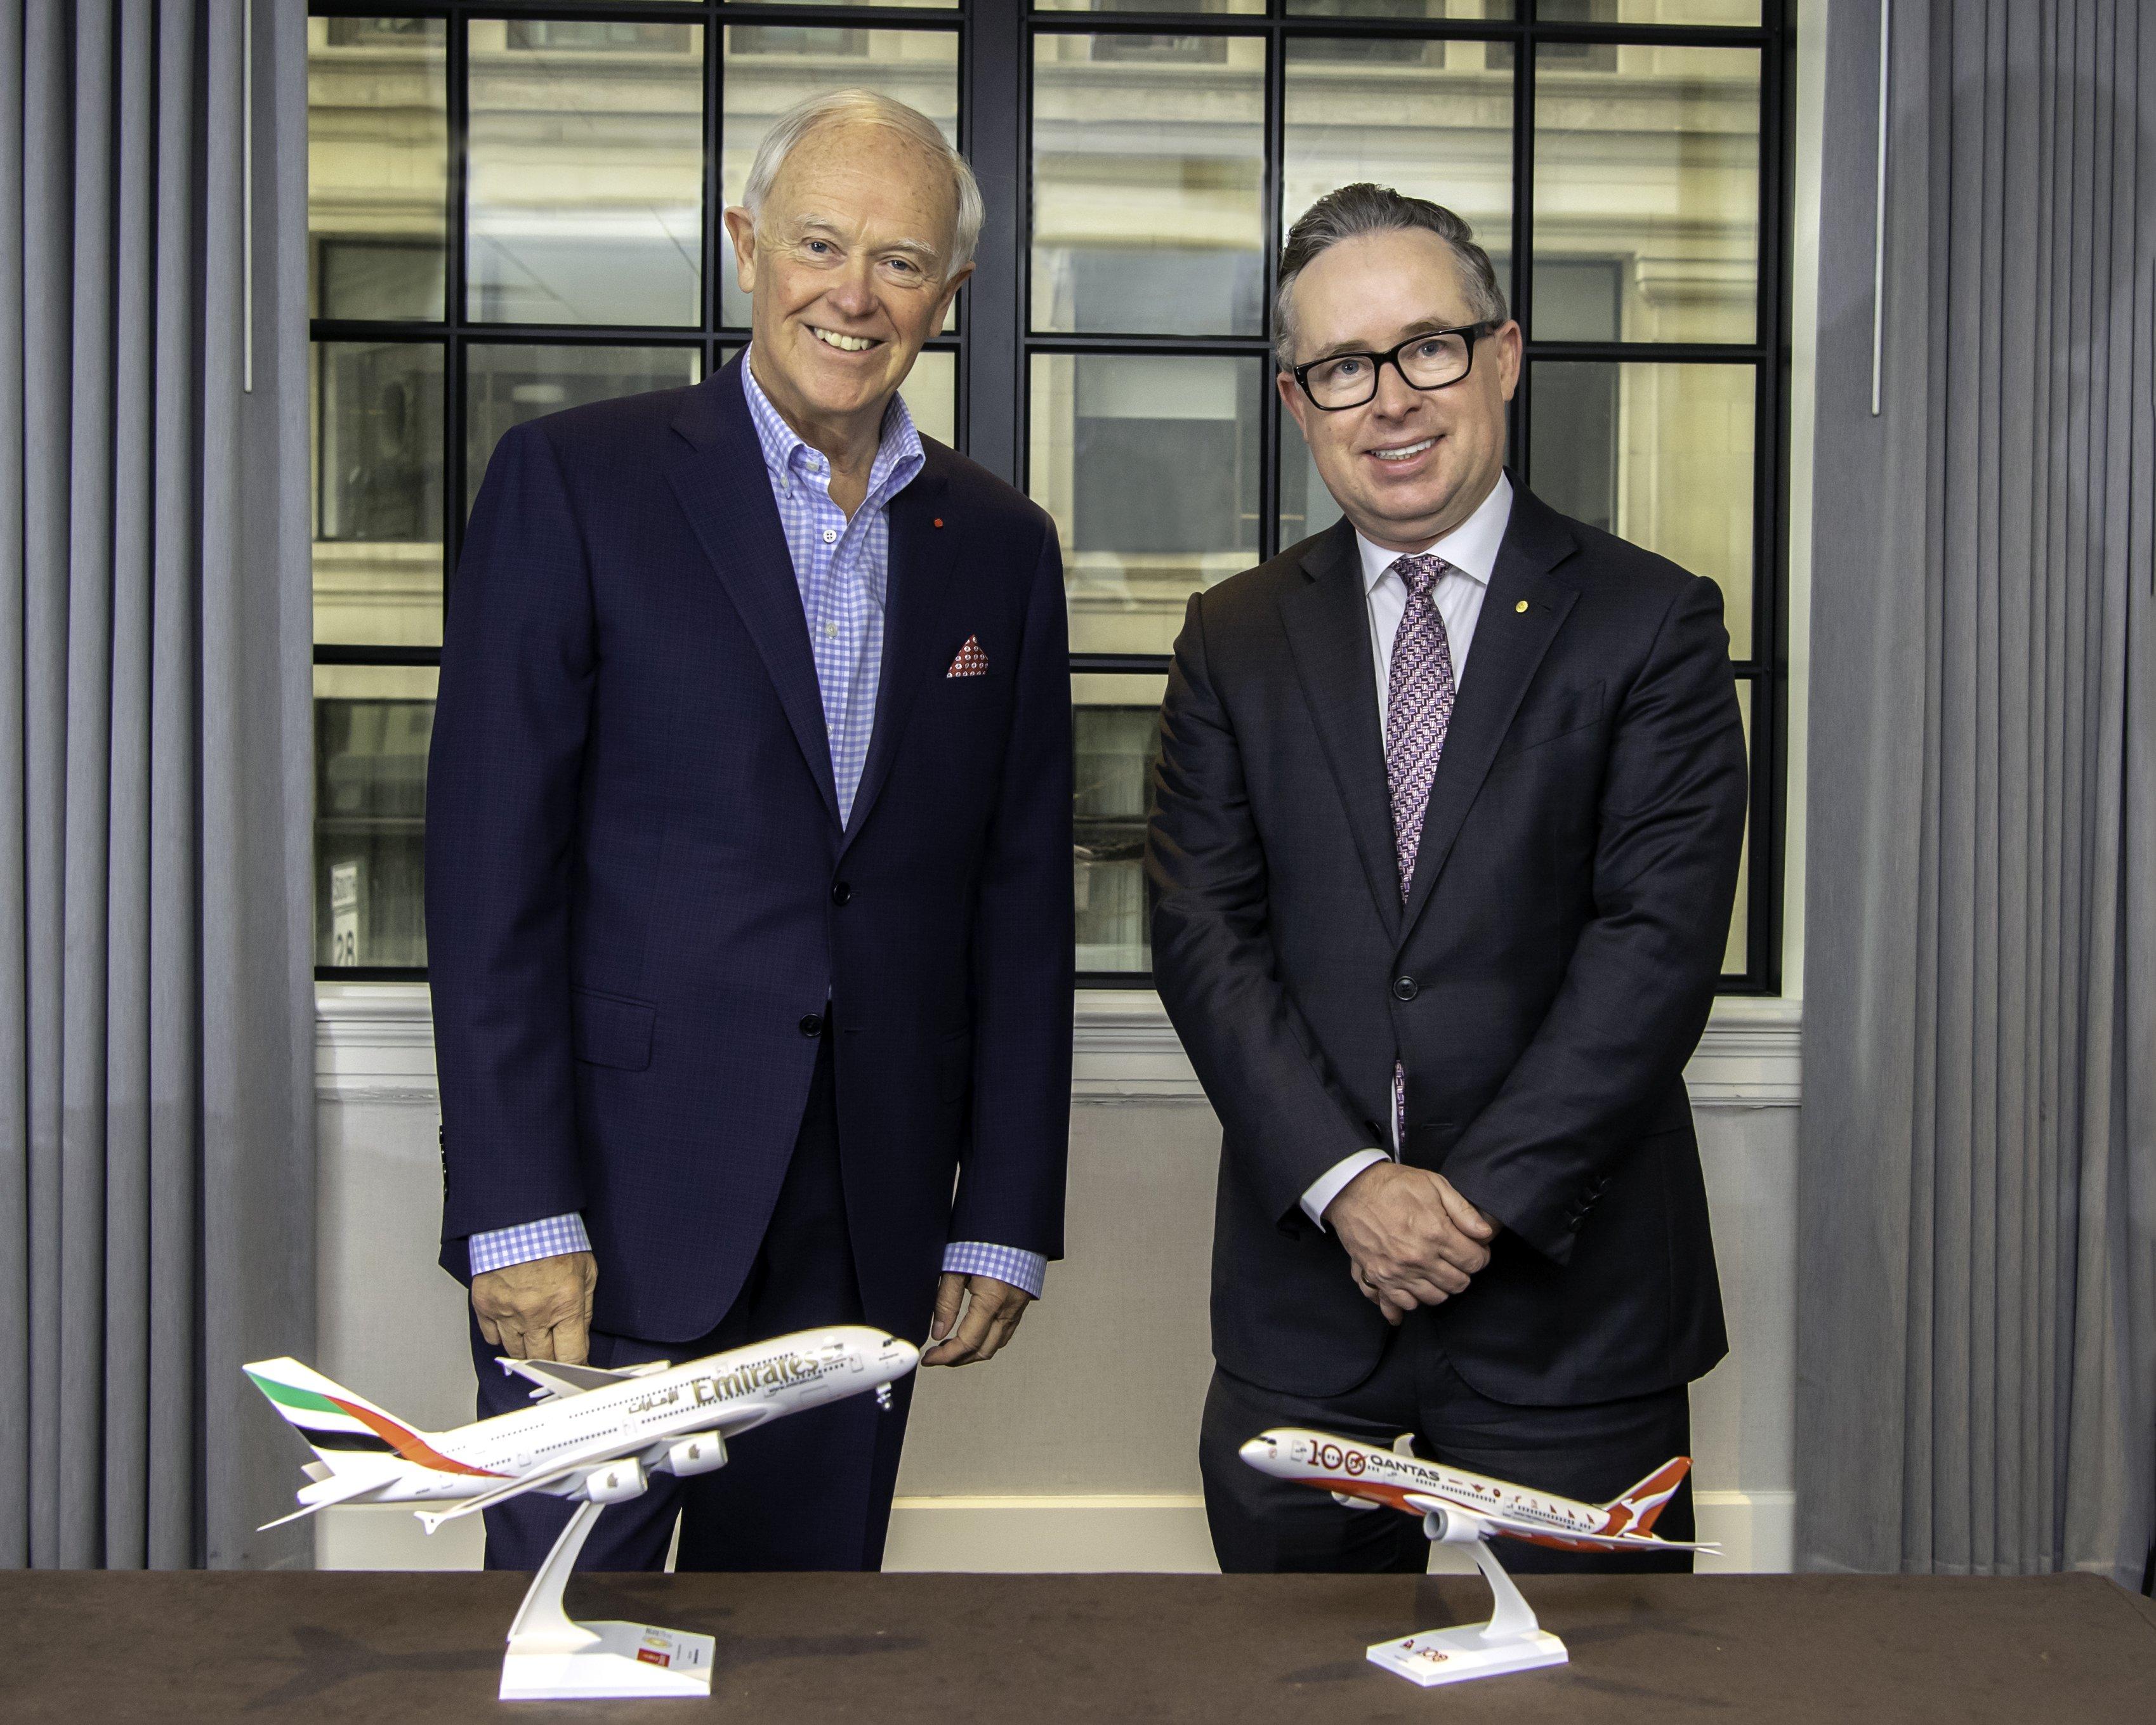 Emirates and Qantas partnership to continue